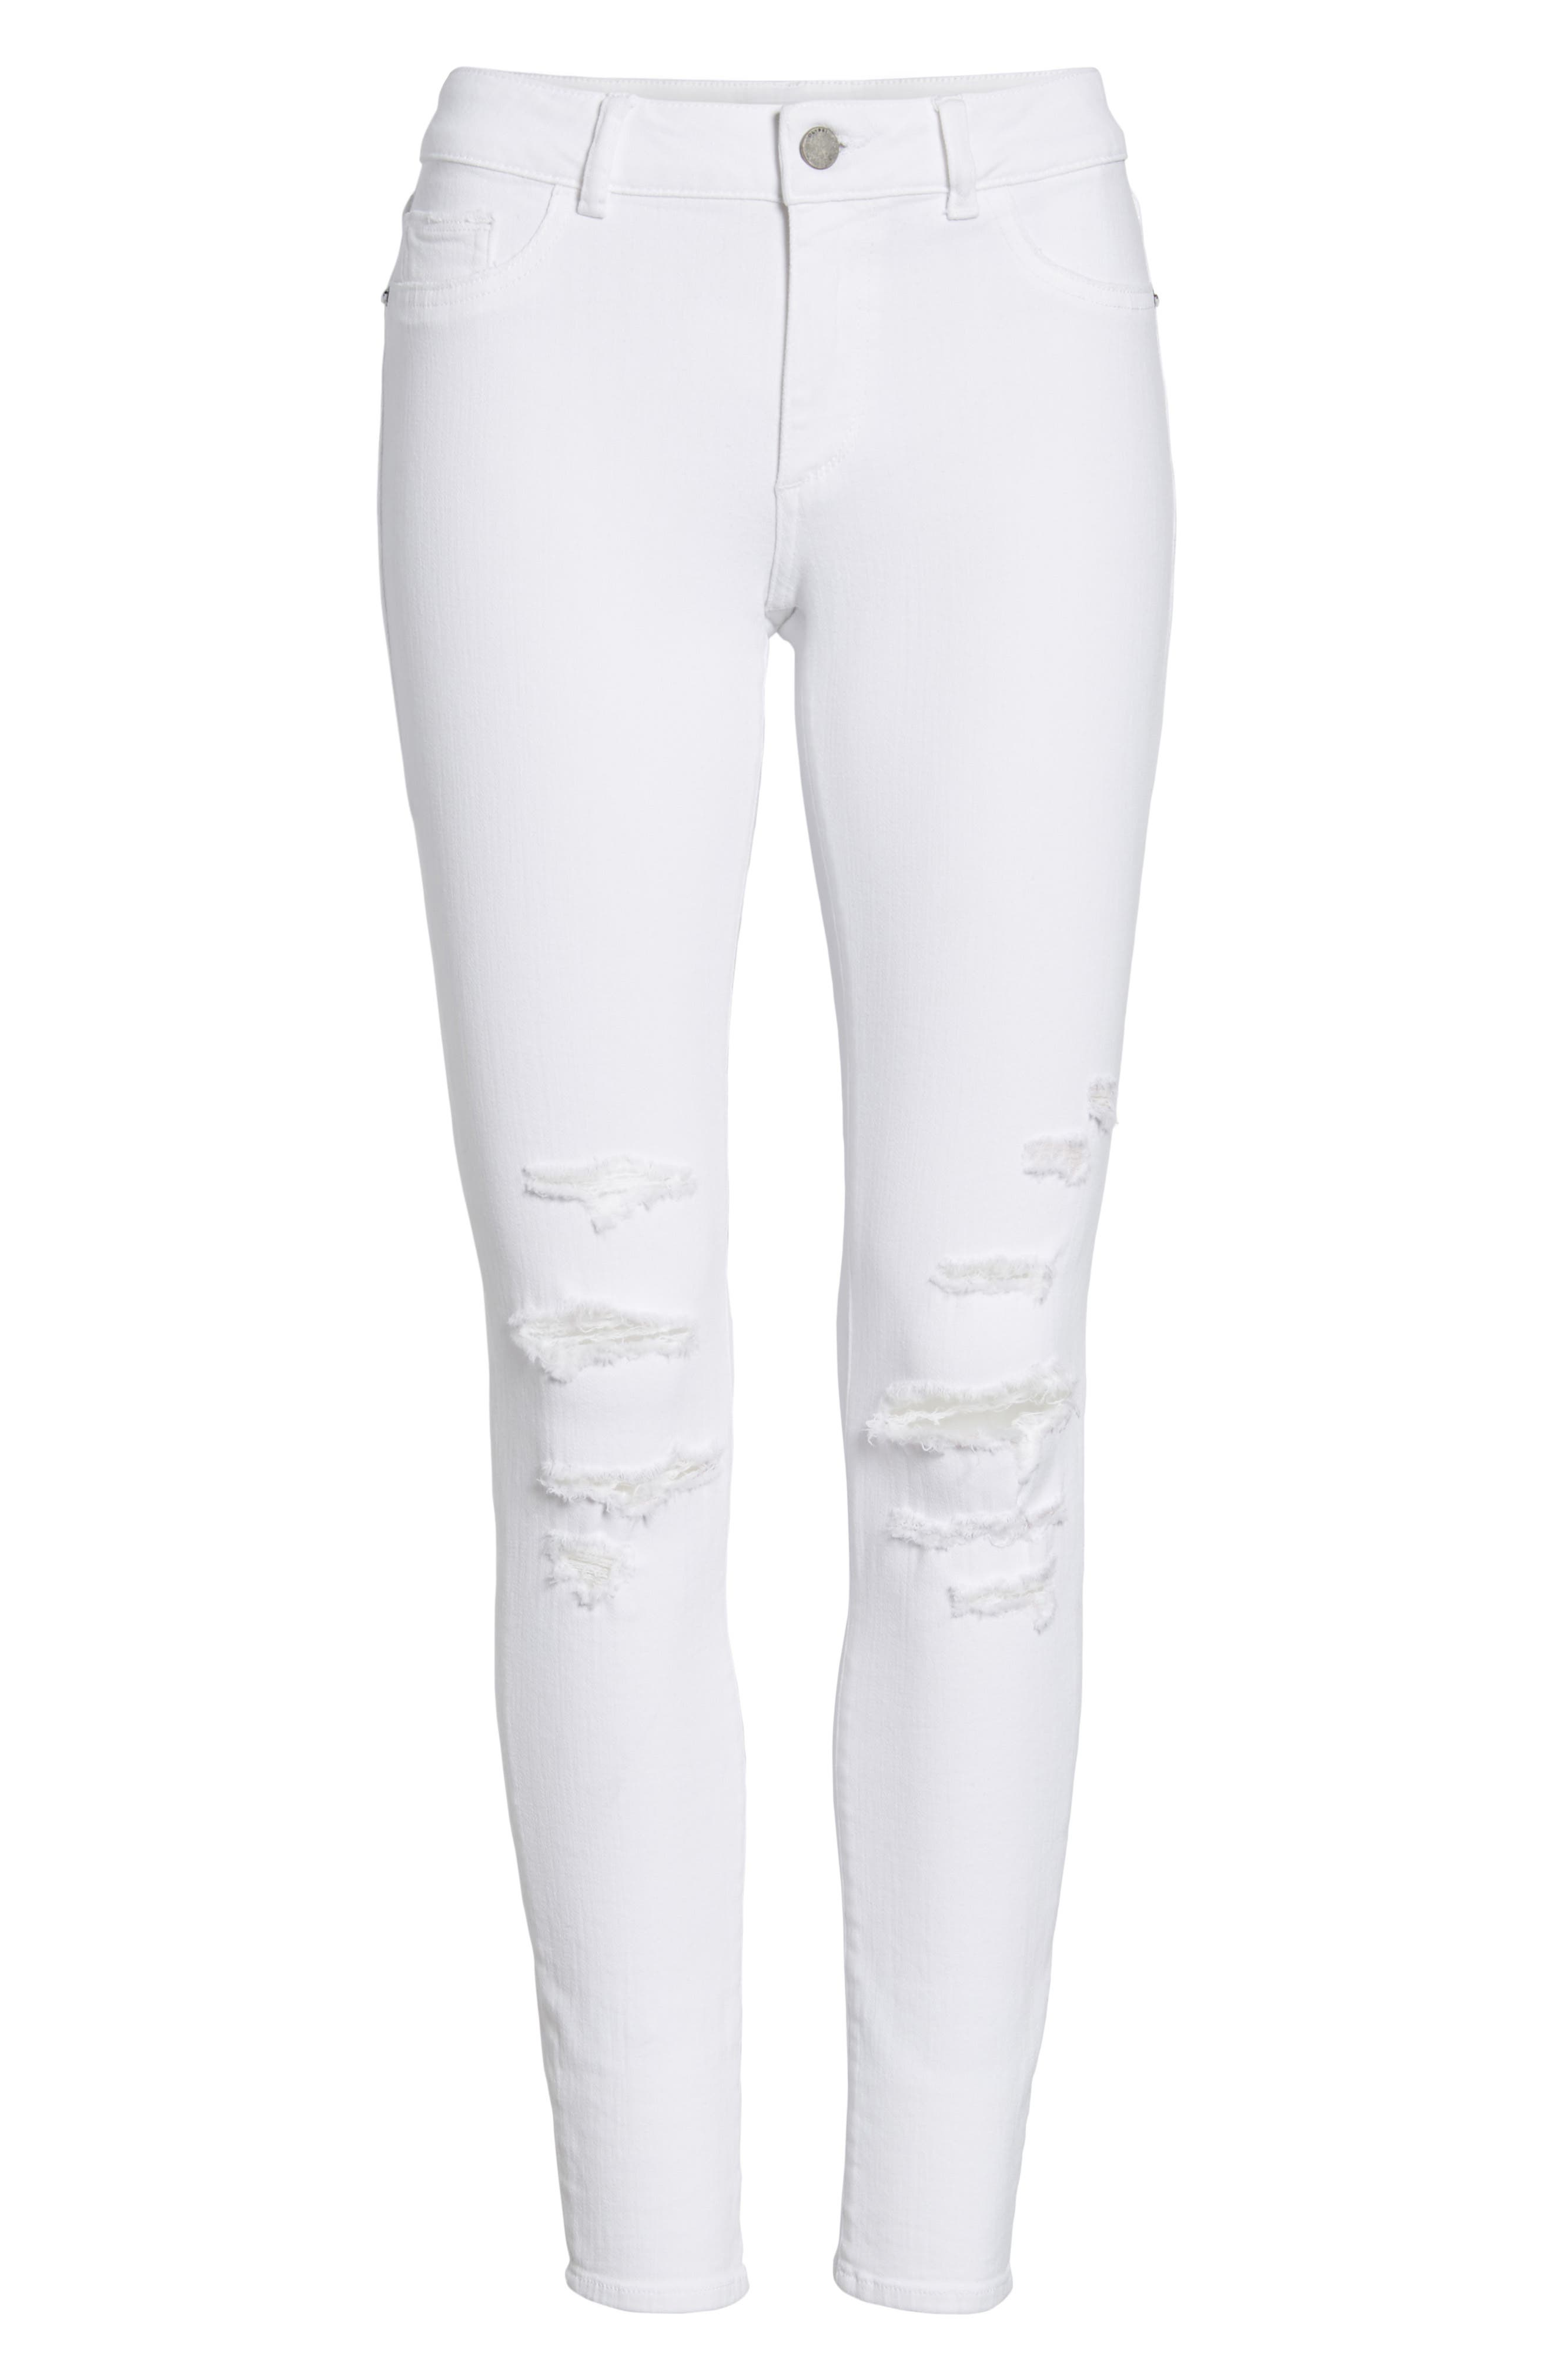 Emma Power Legging Jeans,                             Alternate thumbnail 7, color,                             100